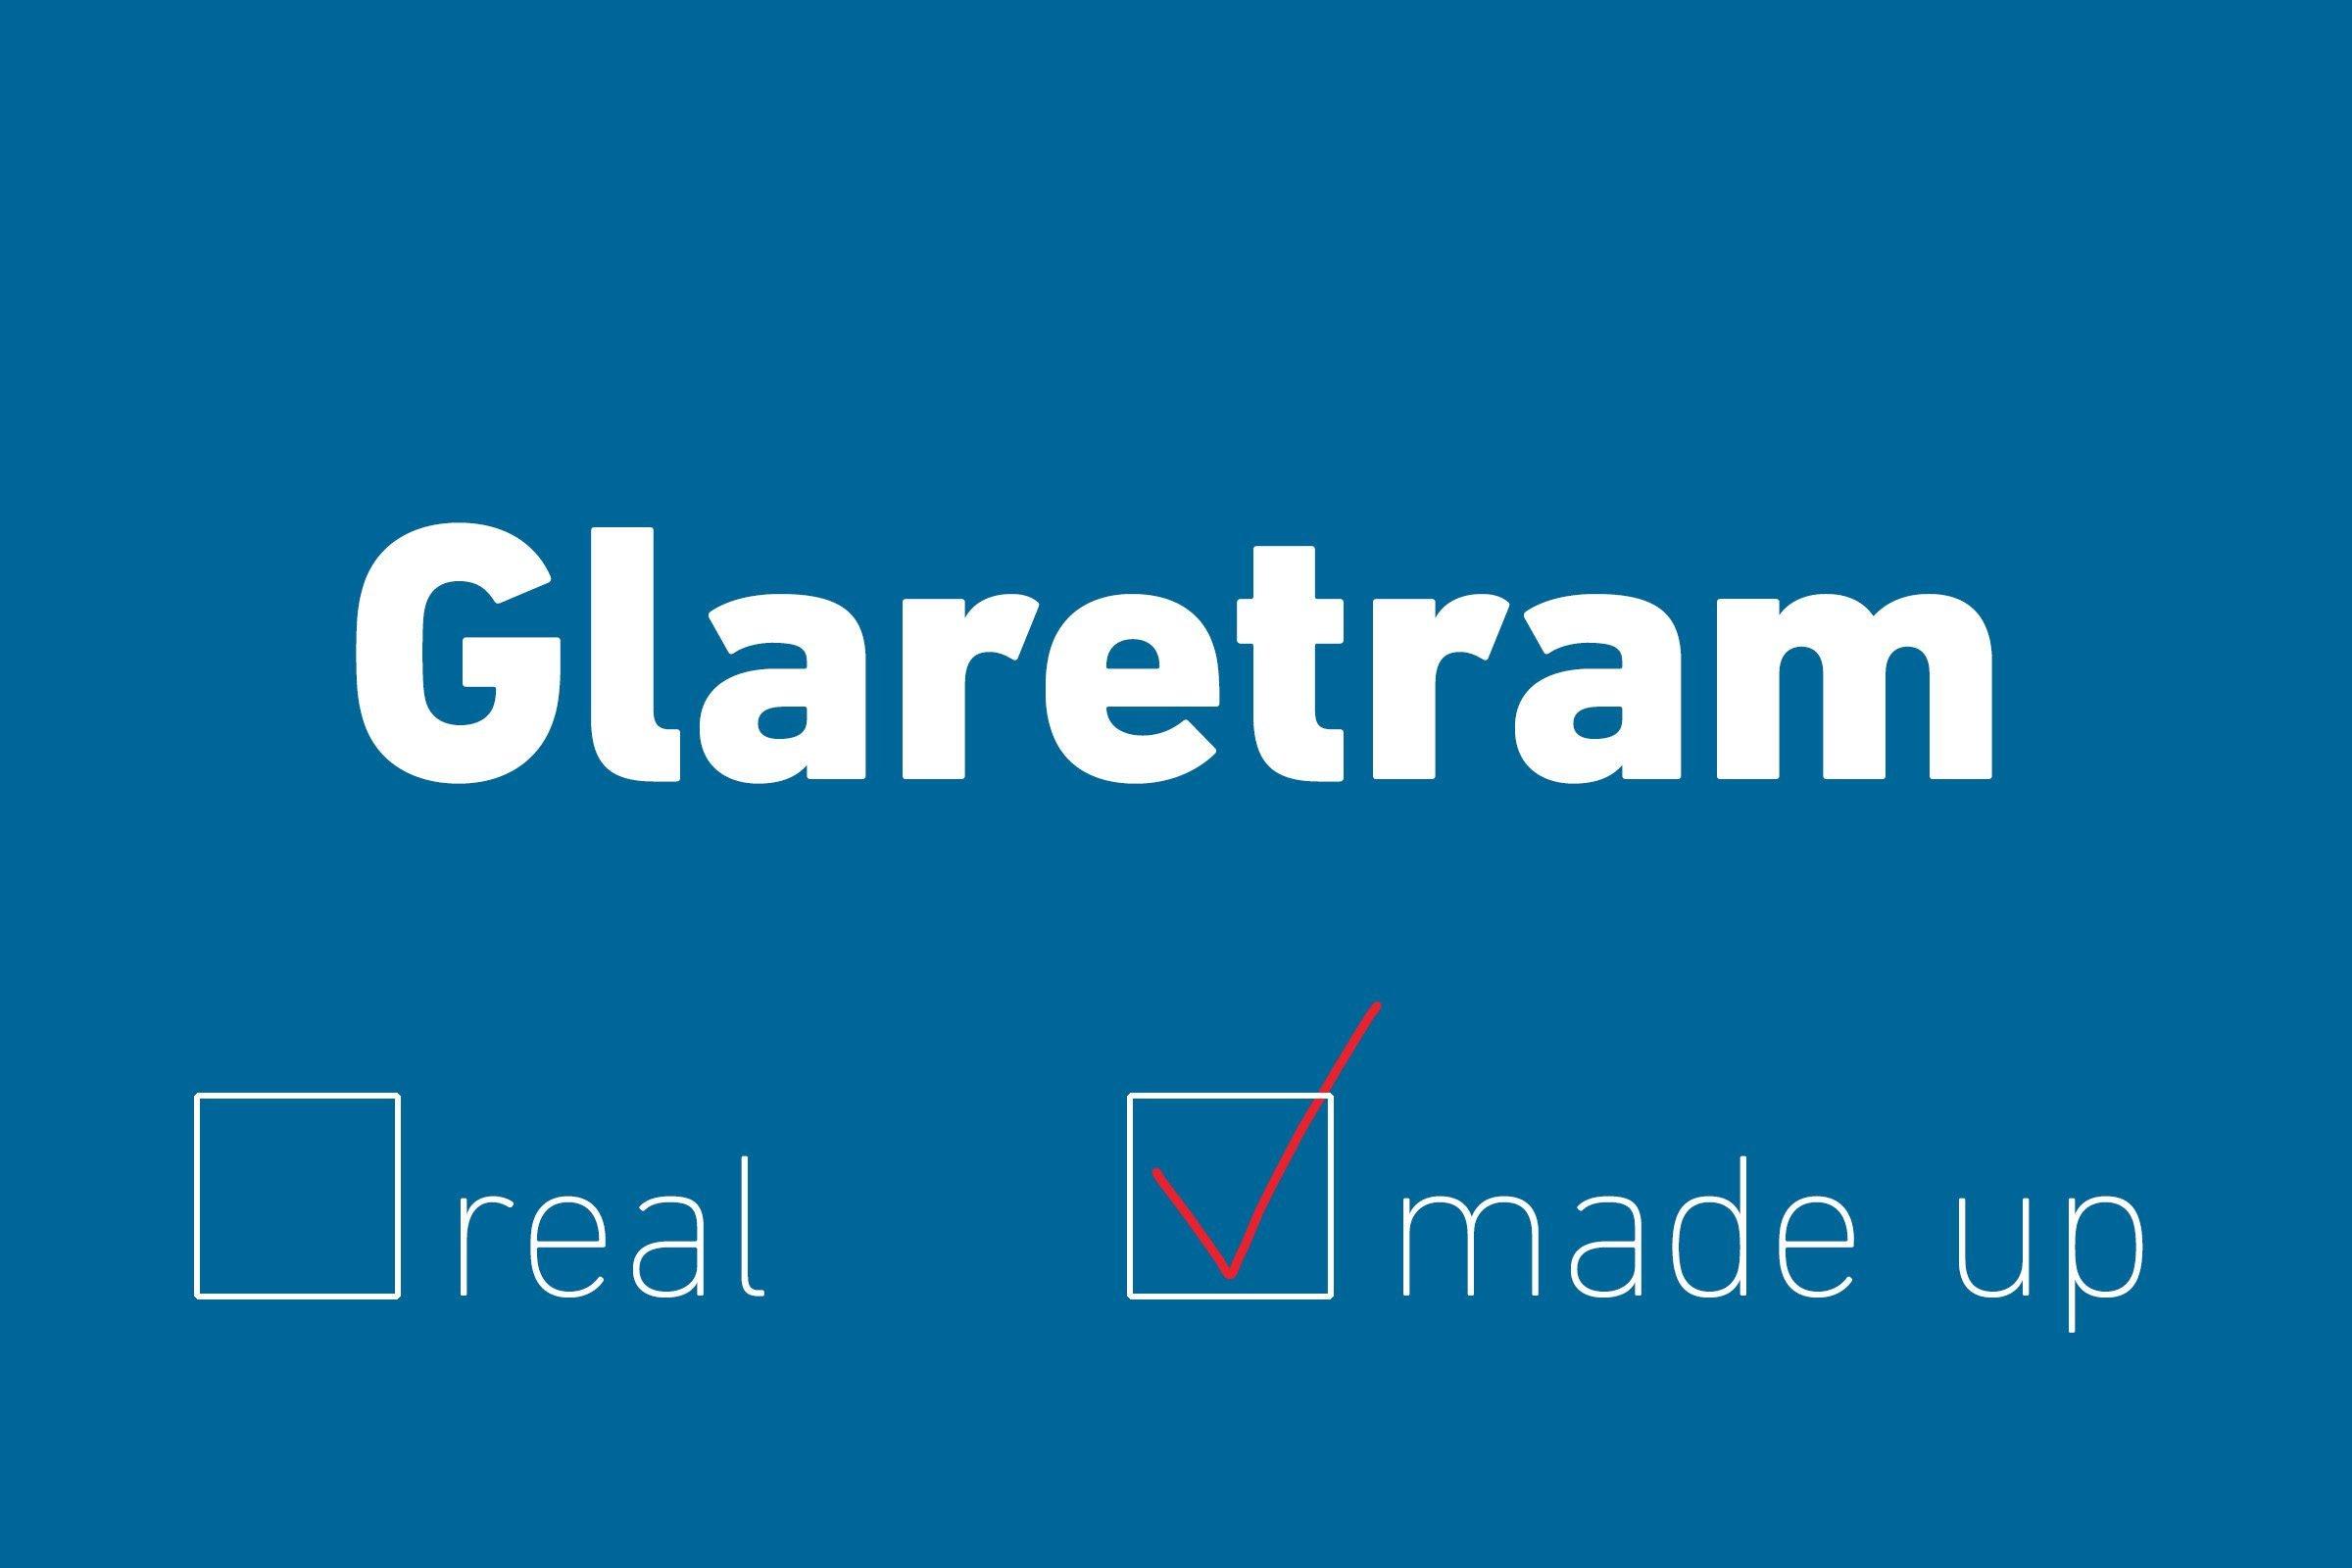 glaretram made up